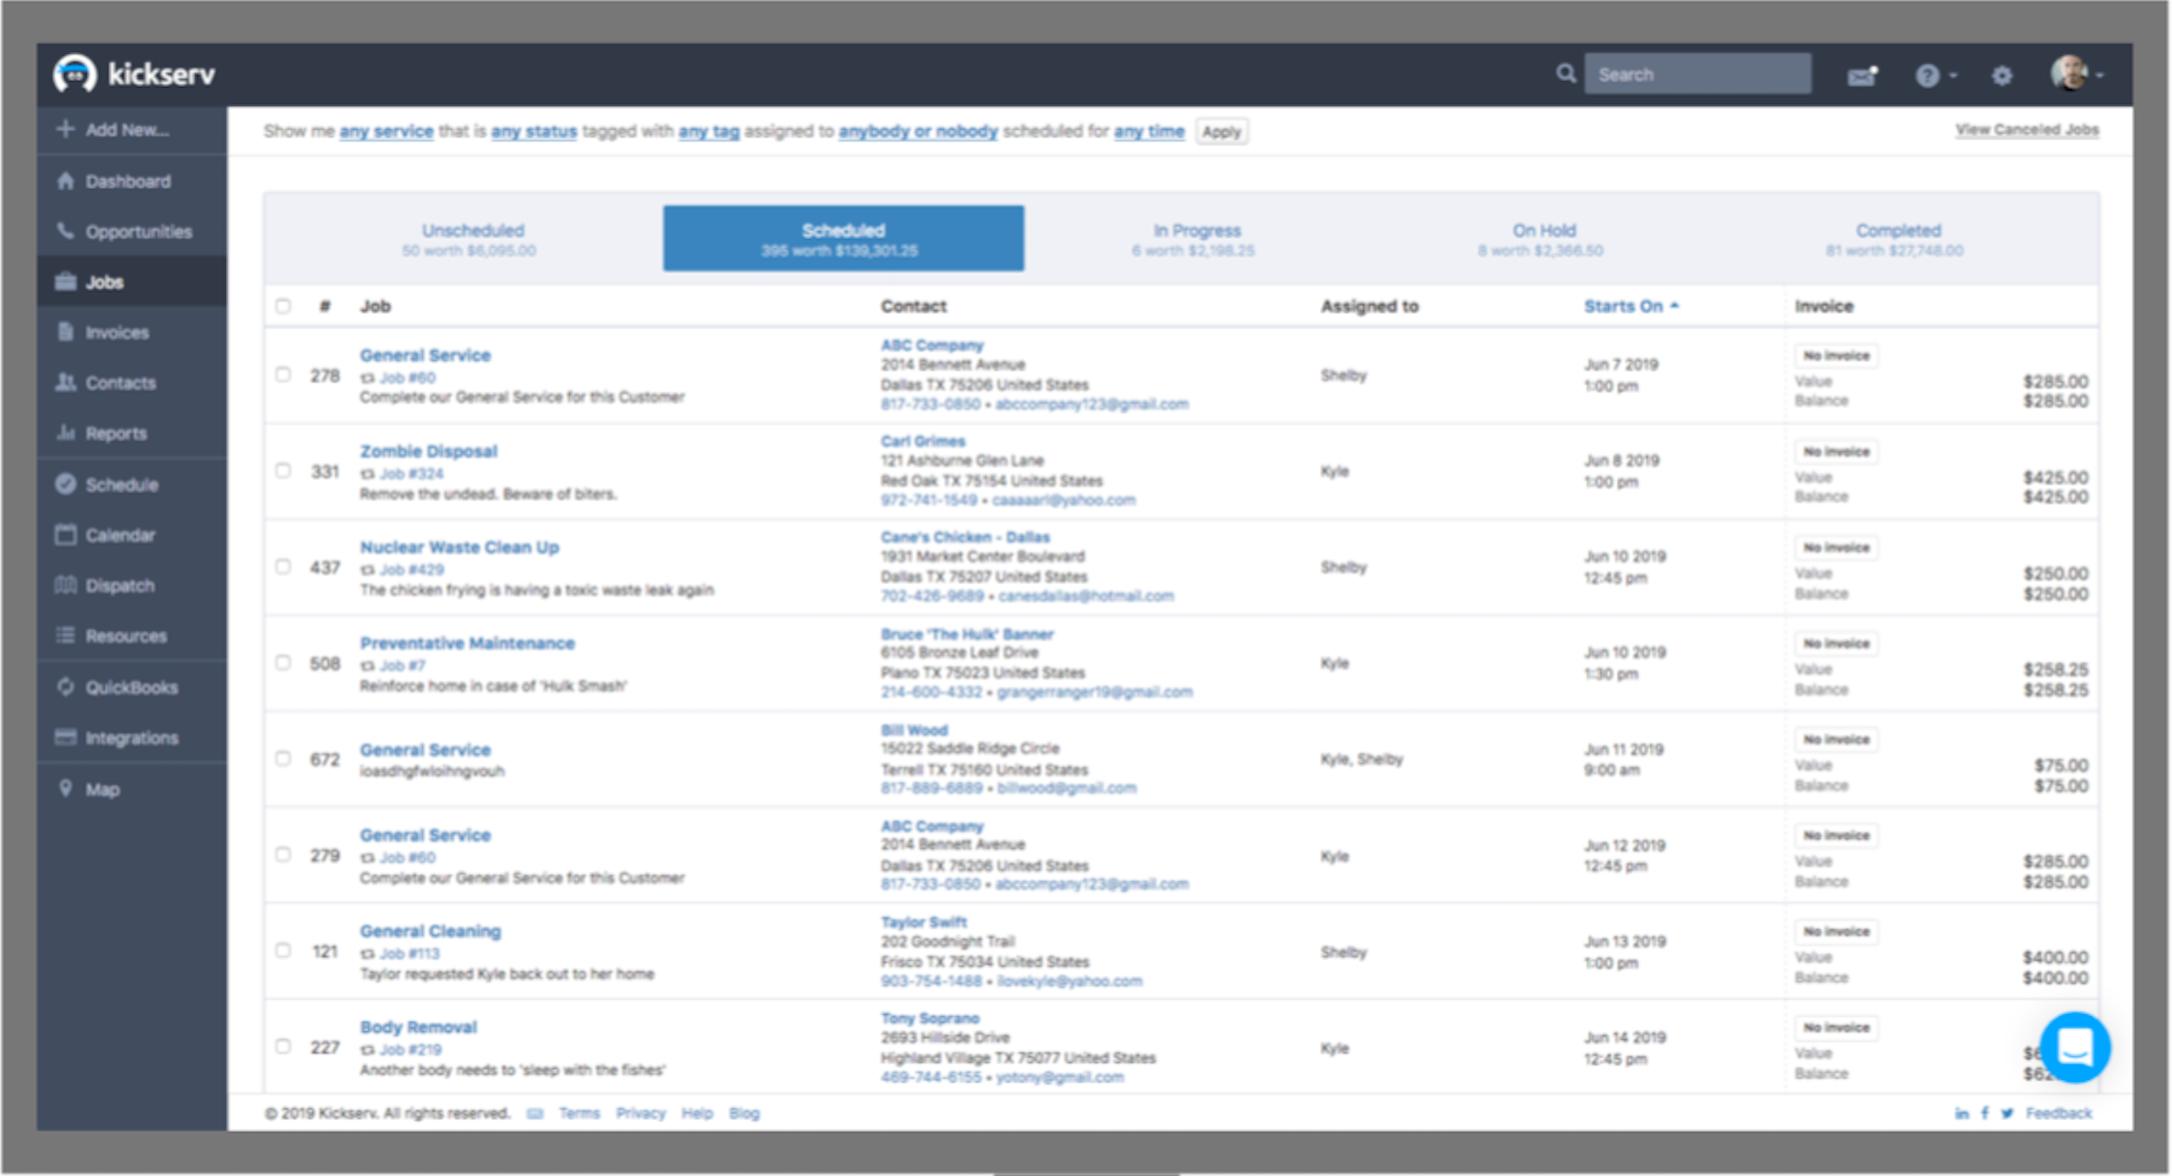 Kickserv Software - Job management